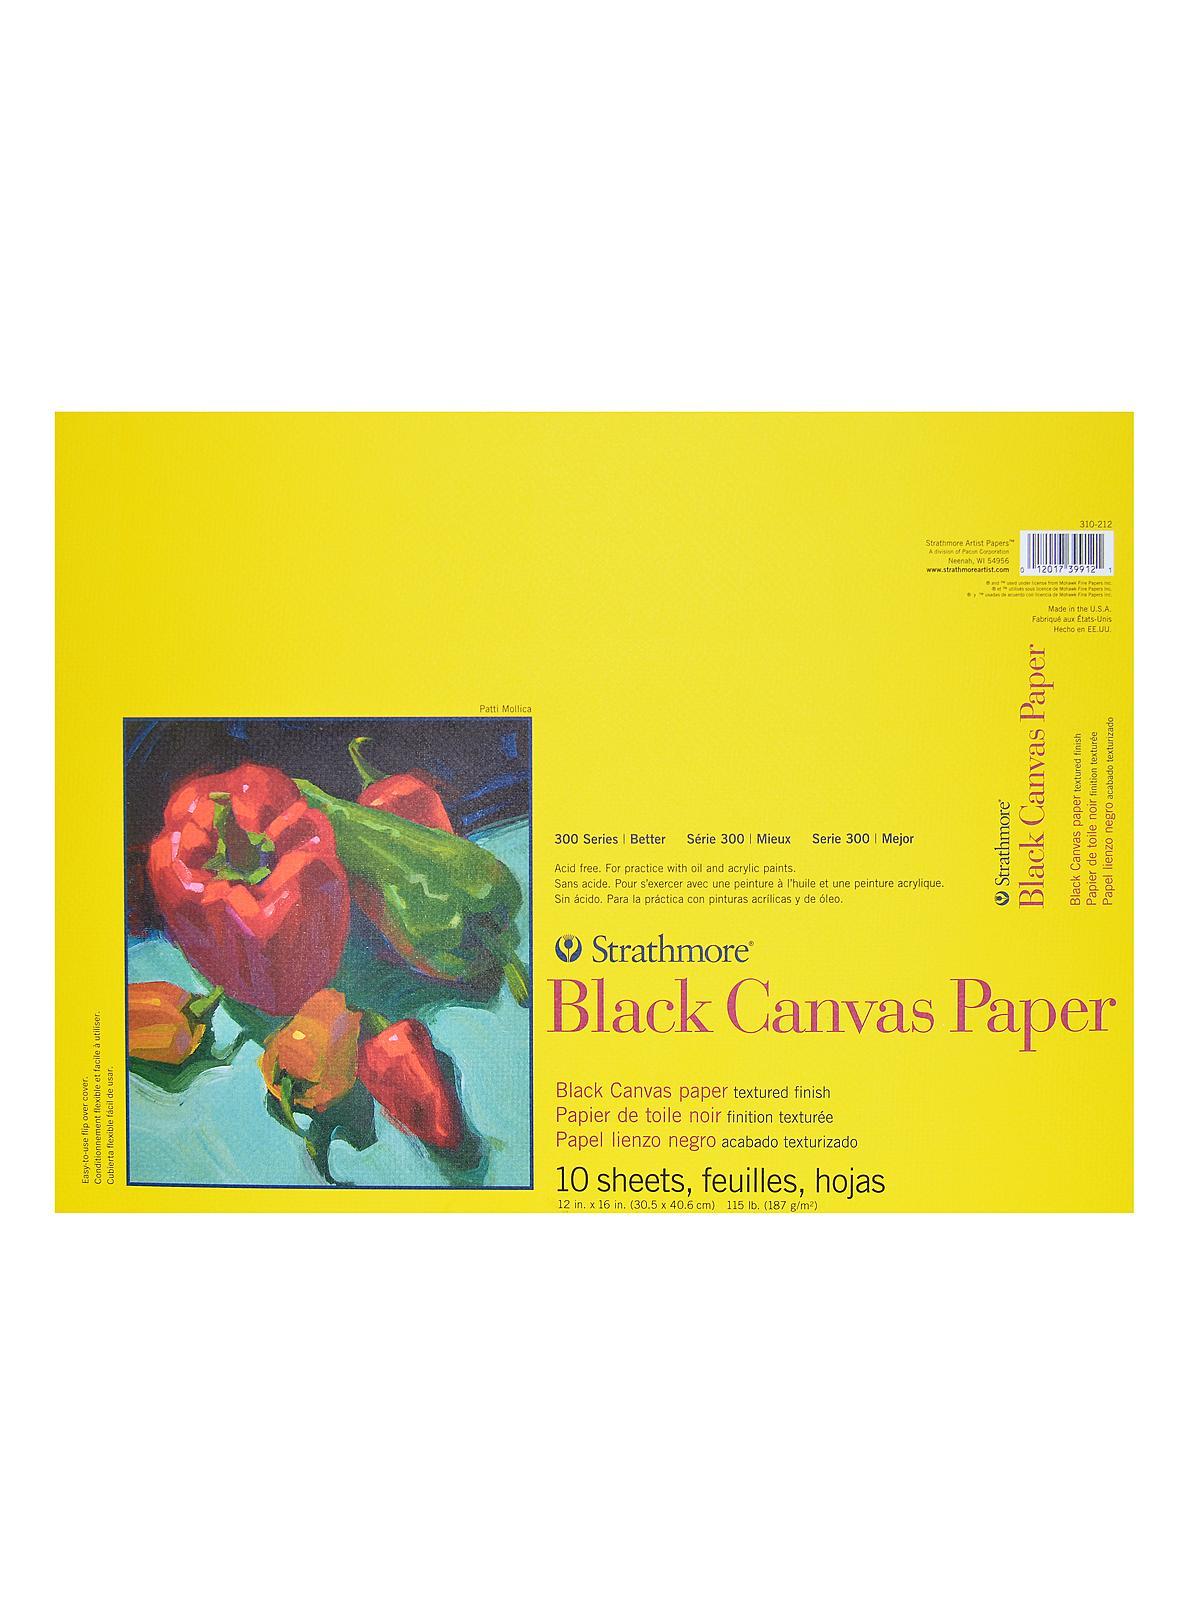 Strathmore 300 Series Black Canvas Paper